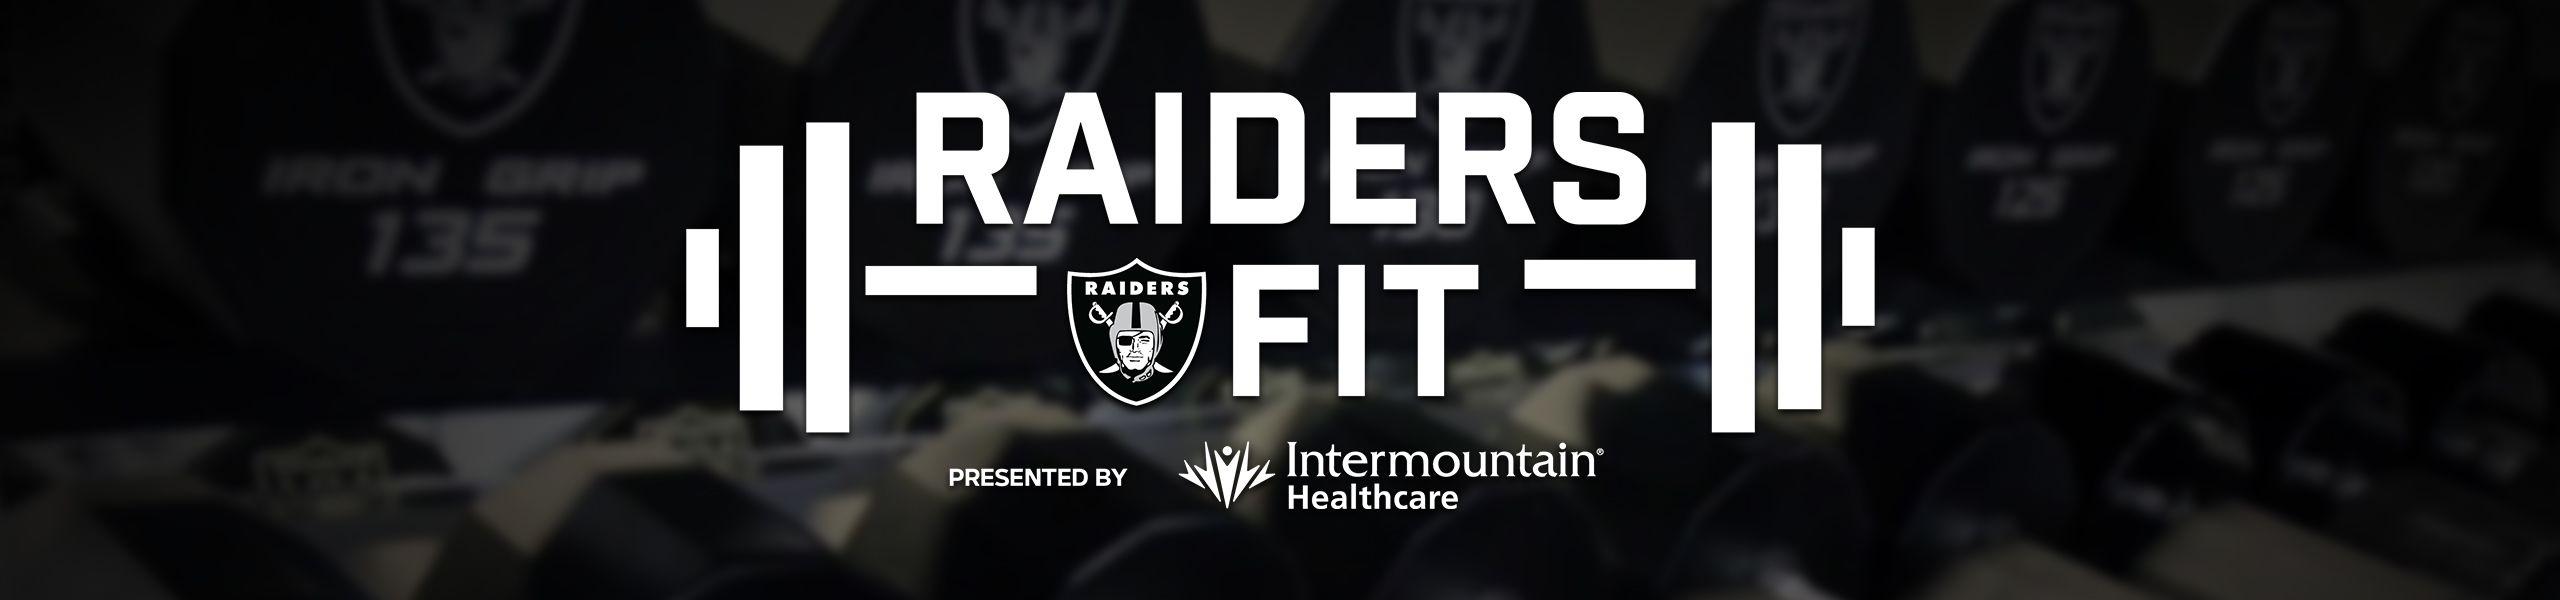 Raiders Fit Header